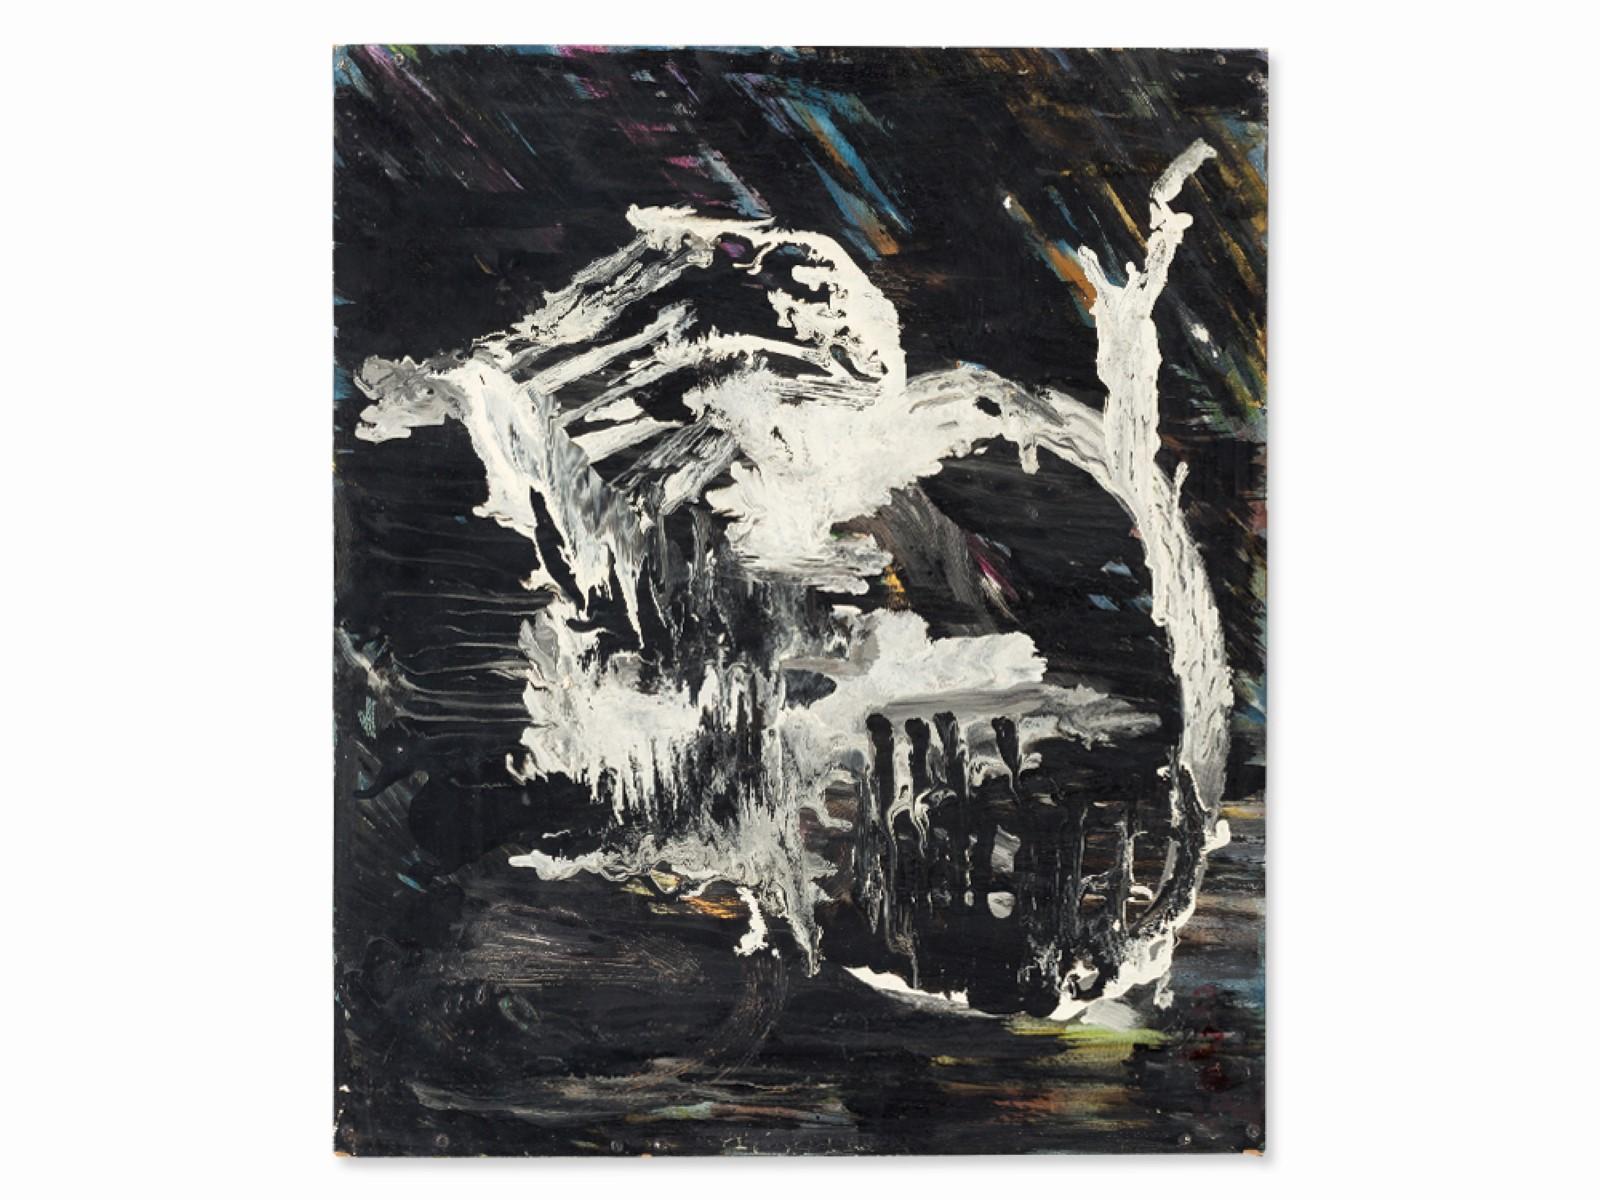 #85 Artist of the 20th Century, Abstract Composition | Künstler des 20. Jahrhundert, Abstrakte Komposition Image